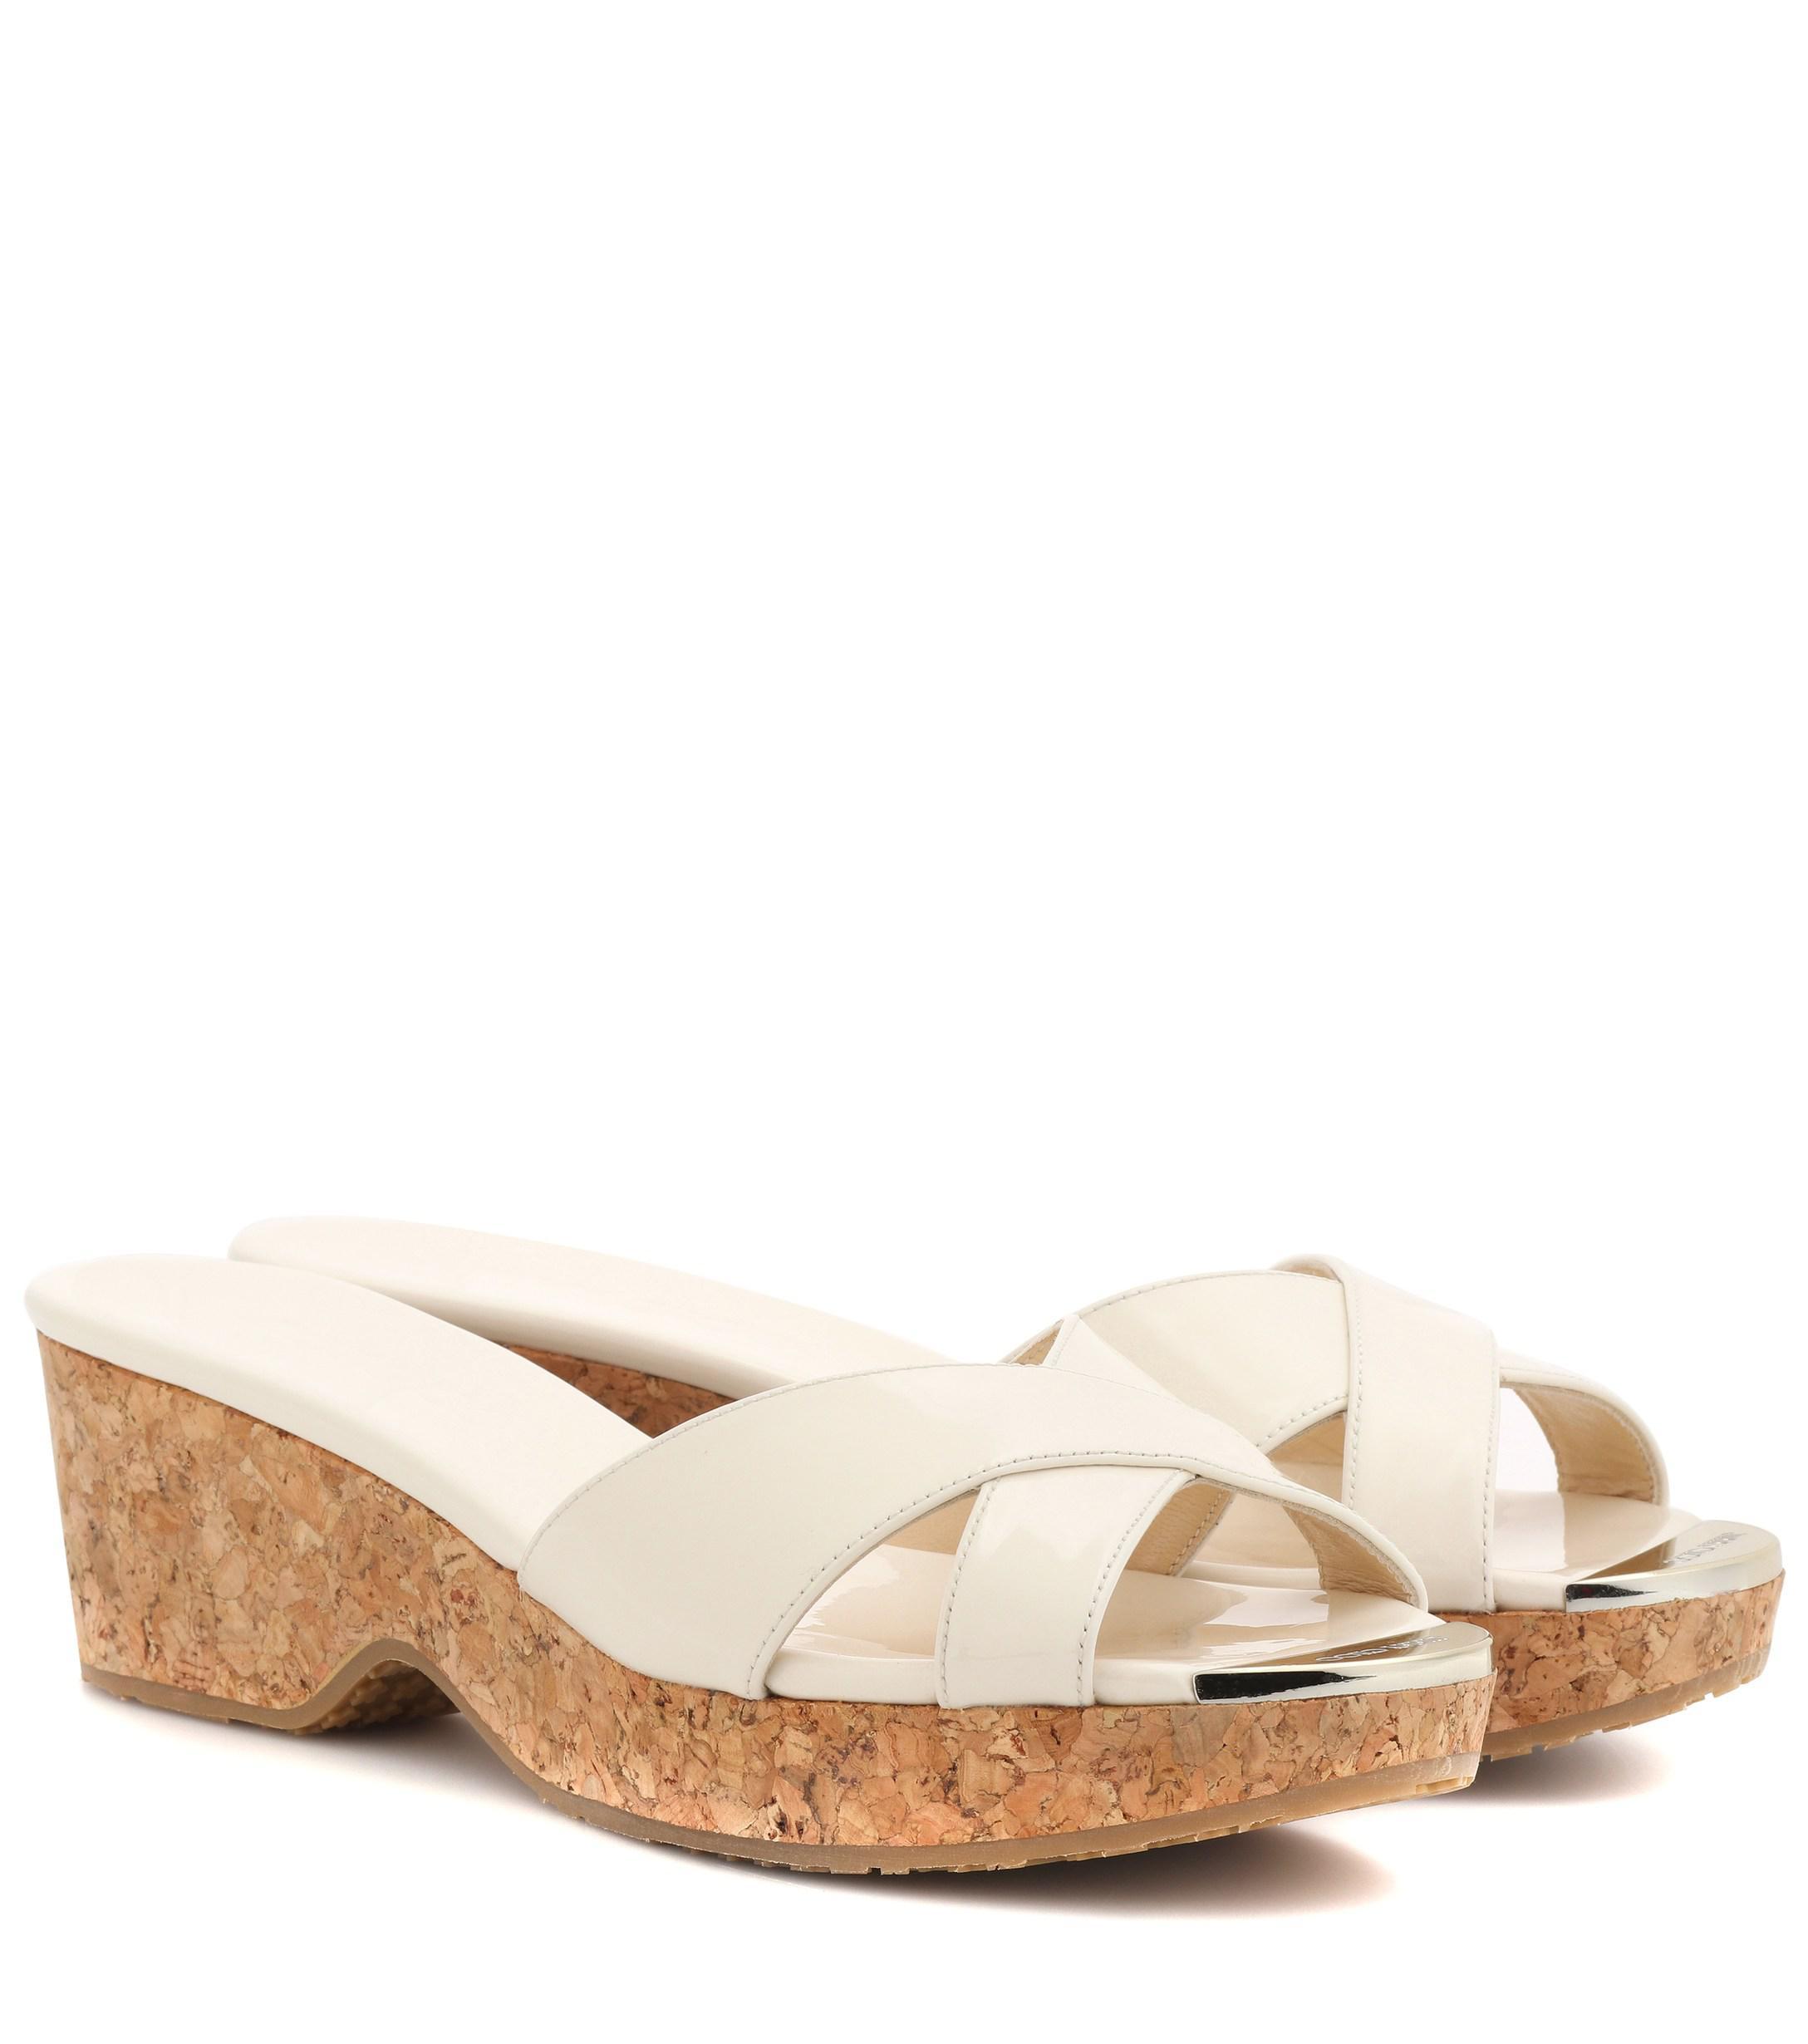 e214eb9f29c10 Jimmy Choo. Women s Panna Patent Leather Sandals